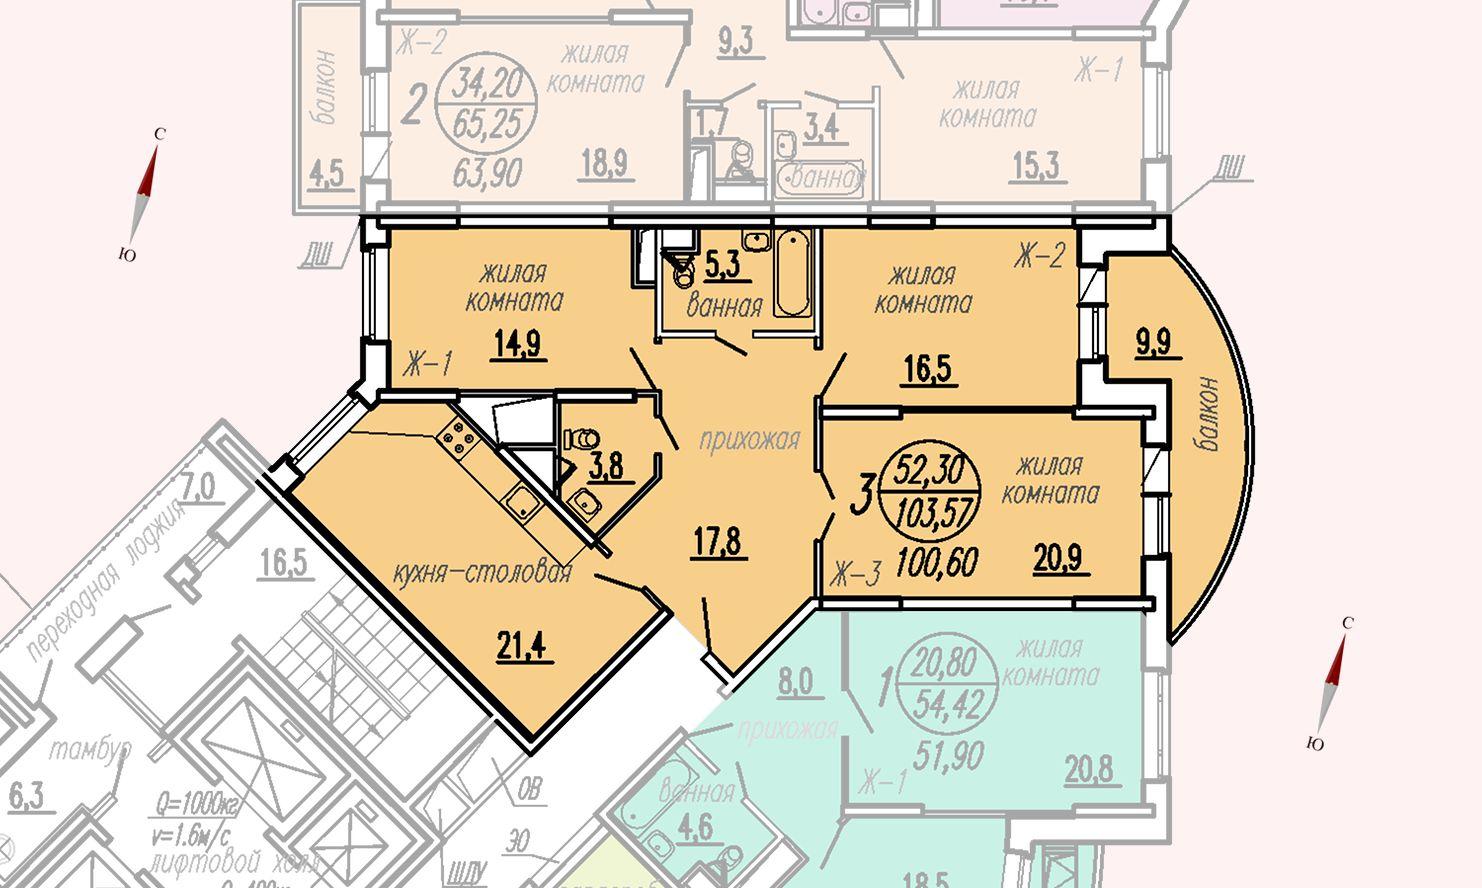 ул. Дирижабельная, д. 1, секция3, квартира 103,57 м2